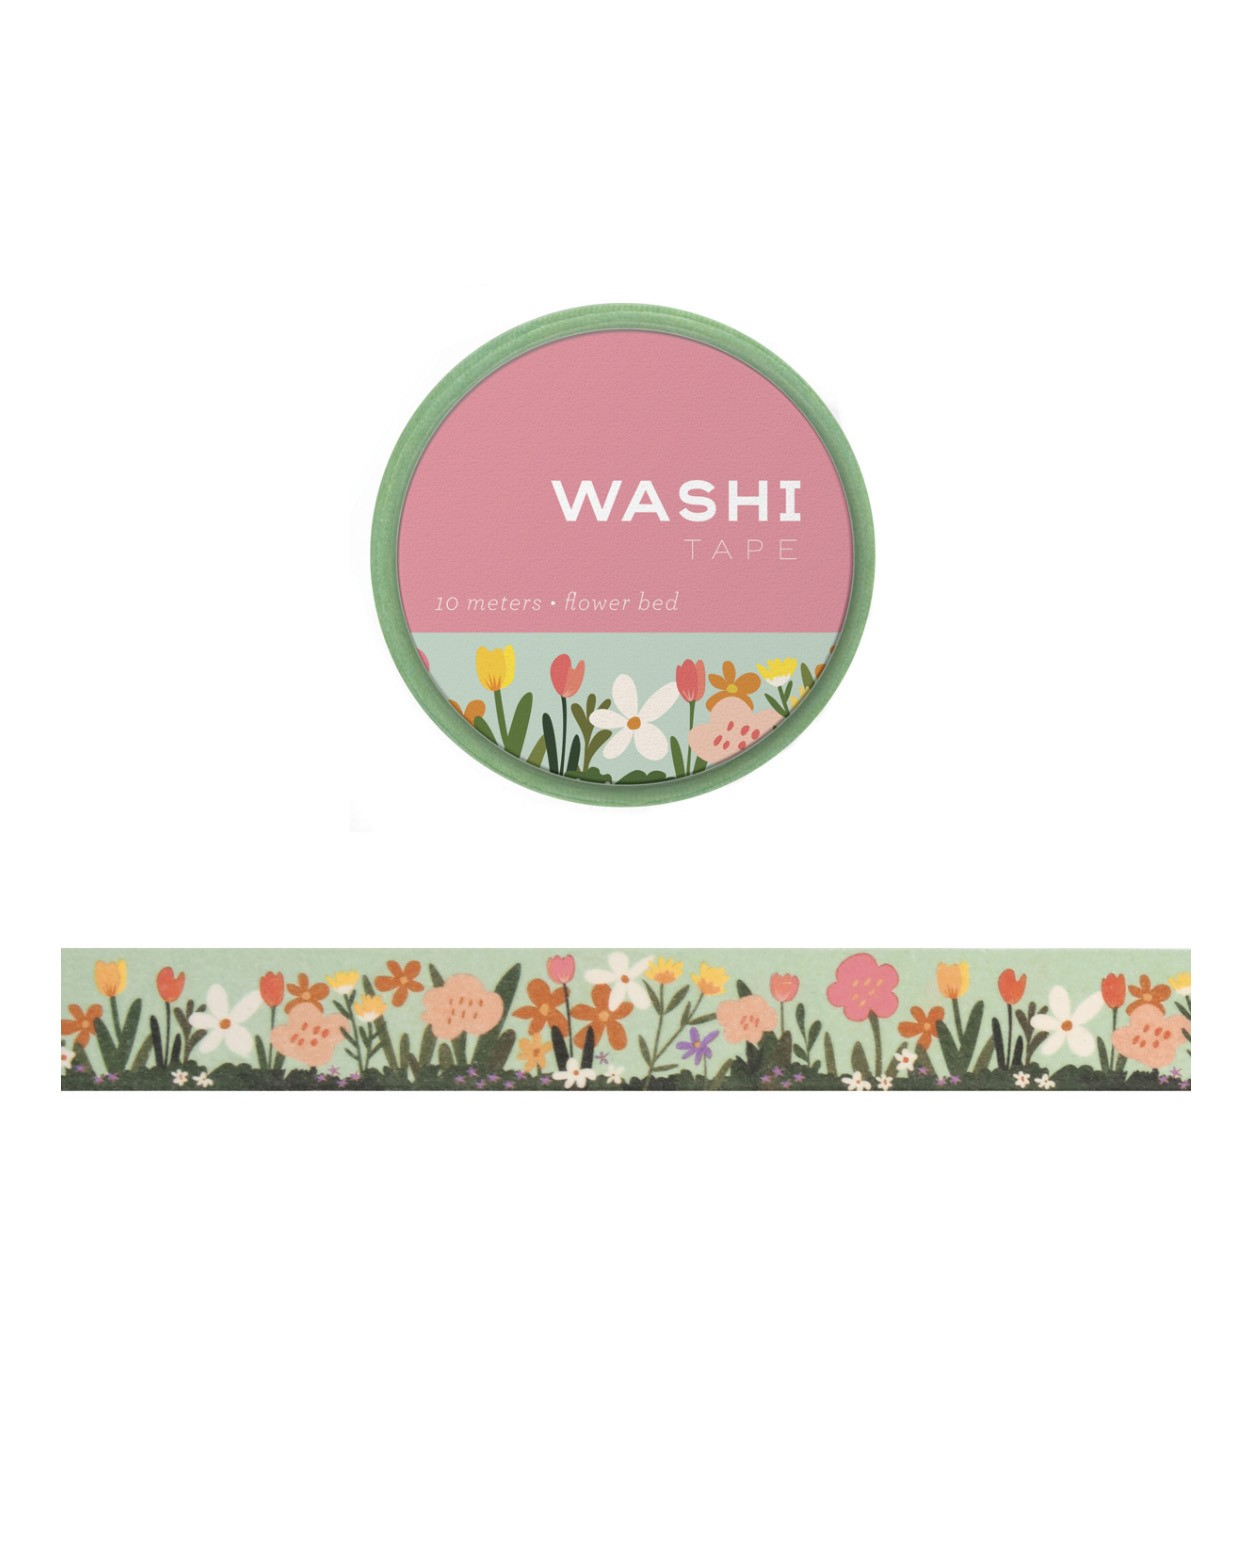 Washi tape - Flower Bed